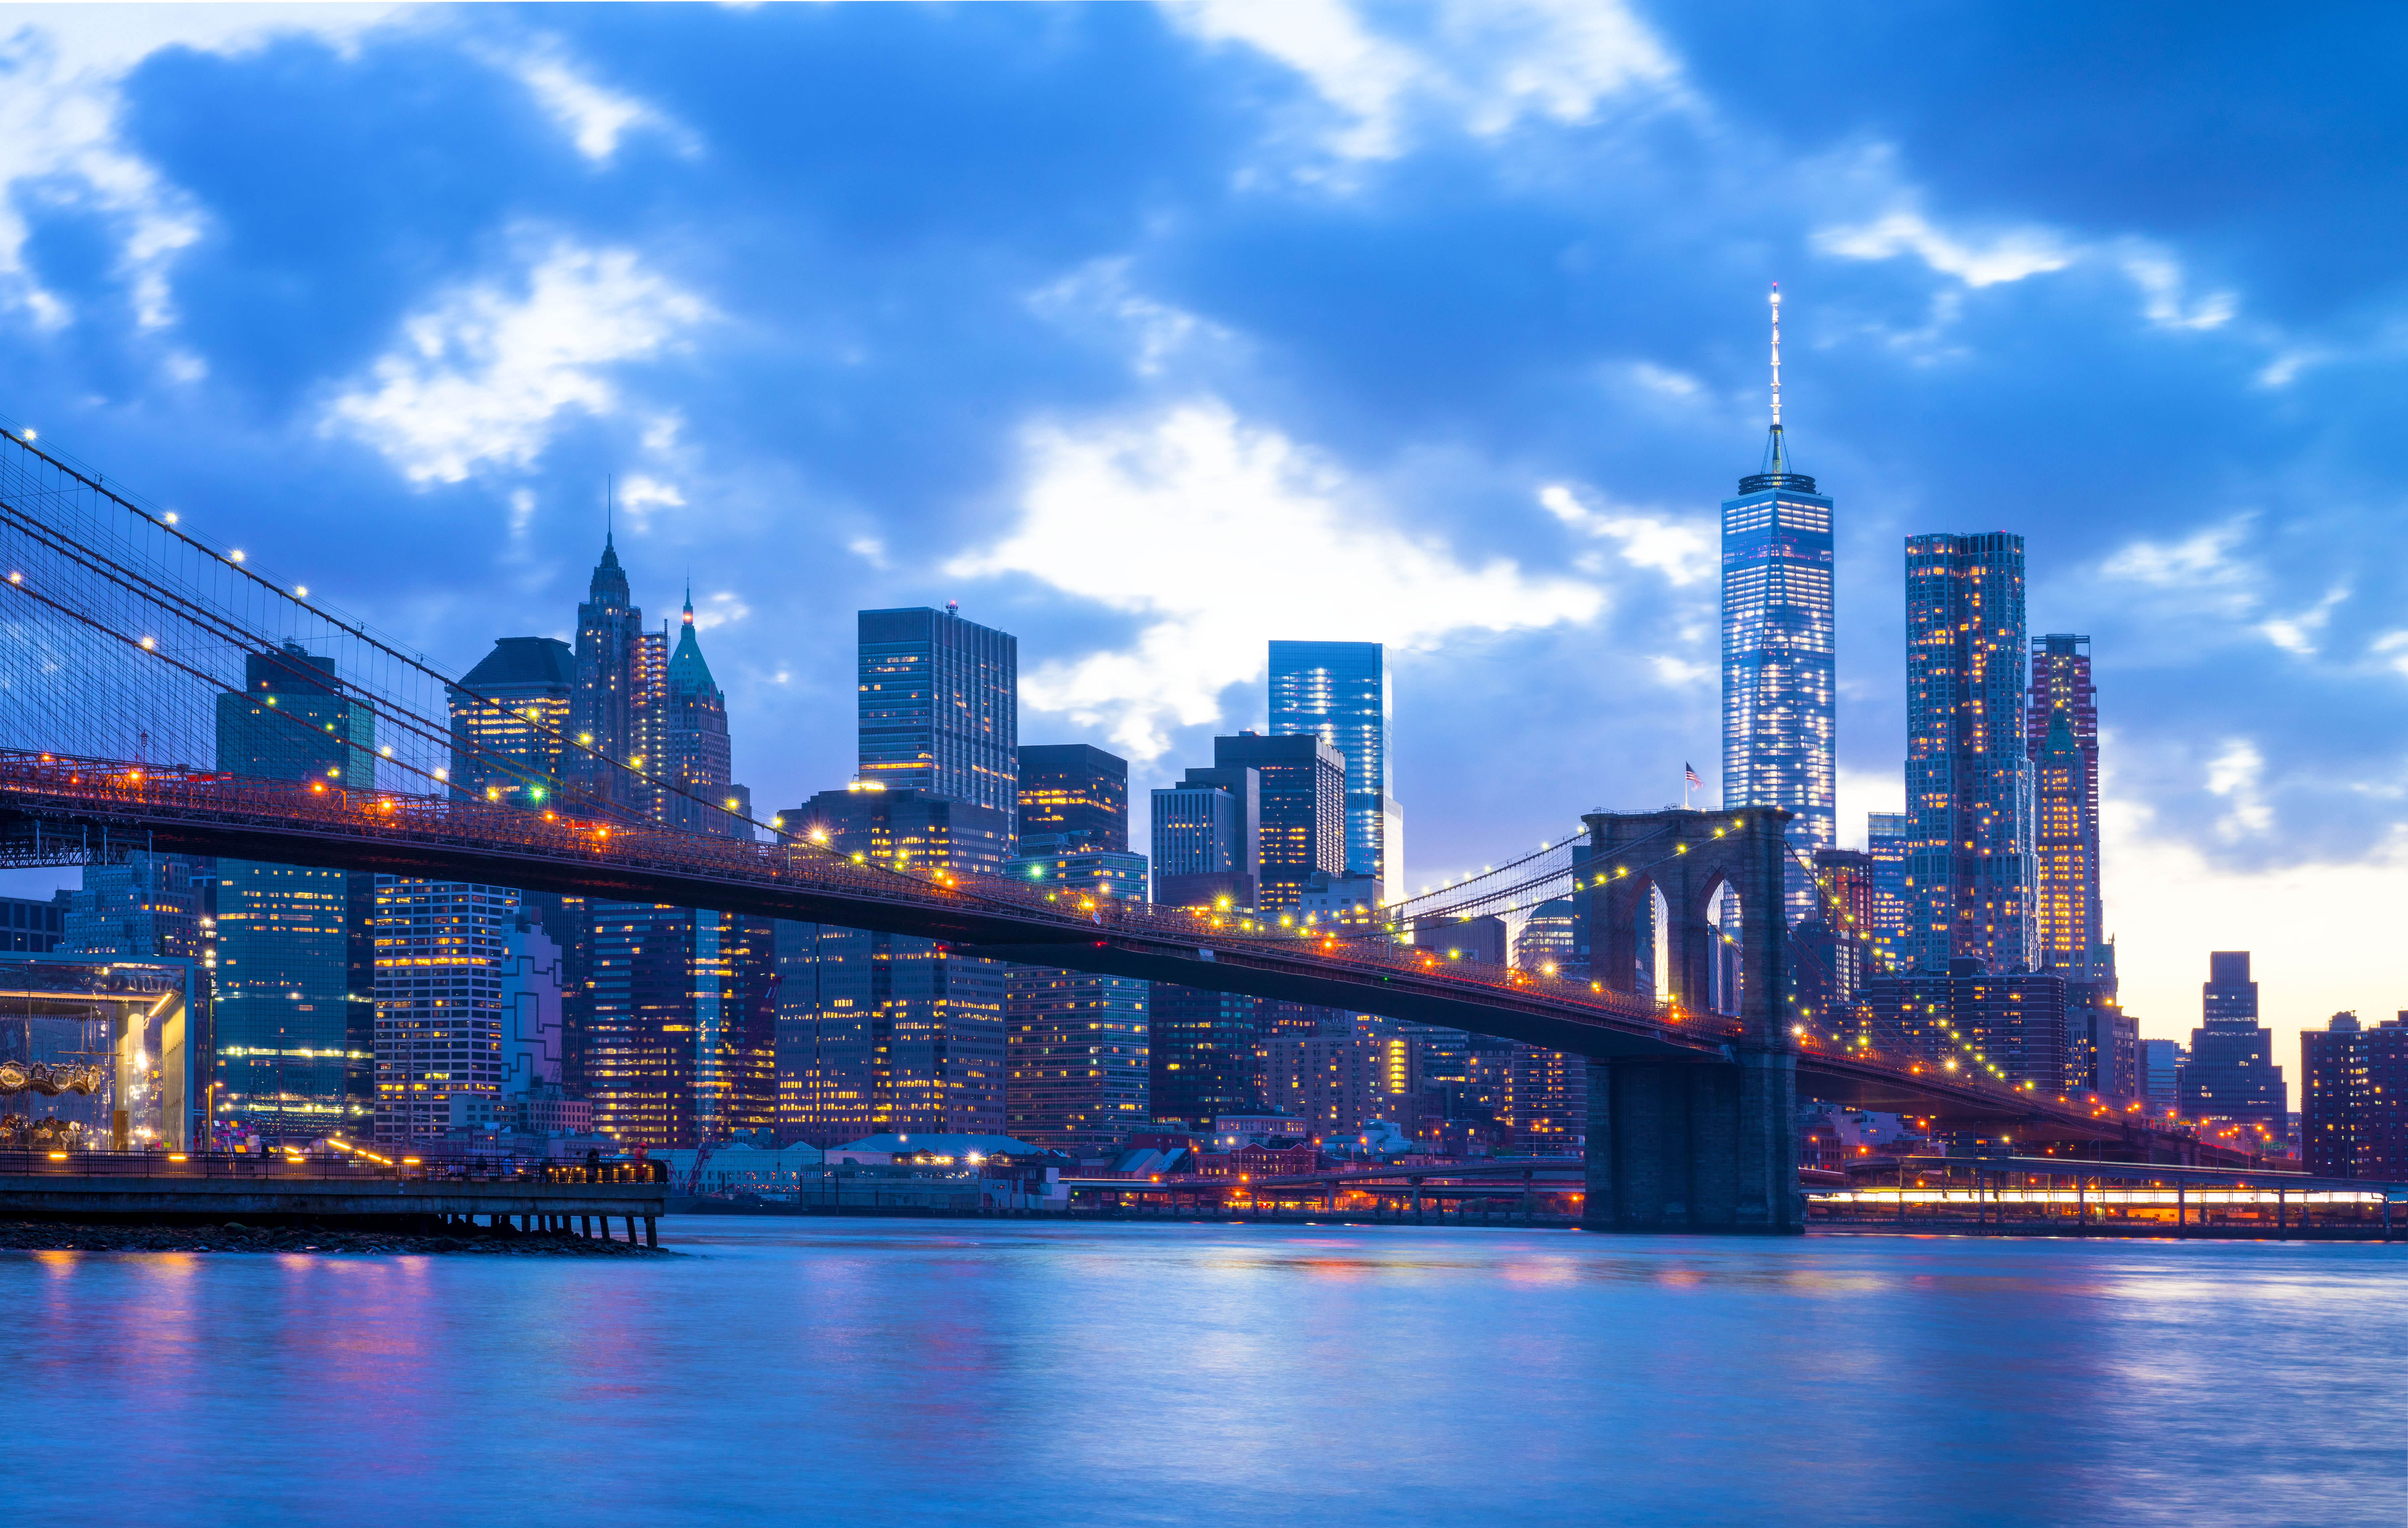 Brooklyn Bridge Background